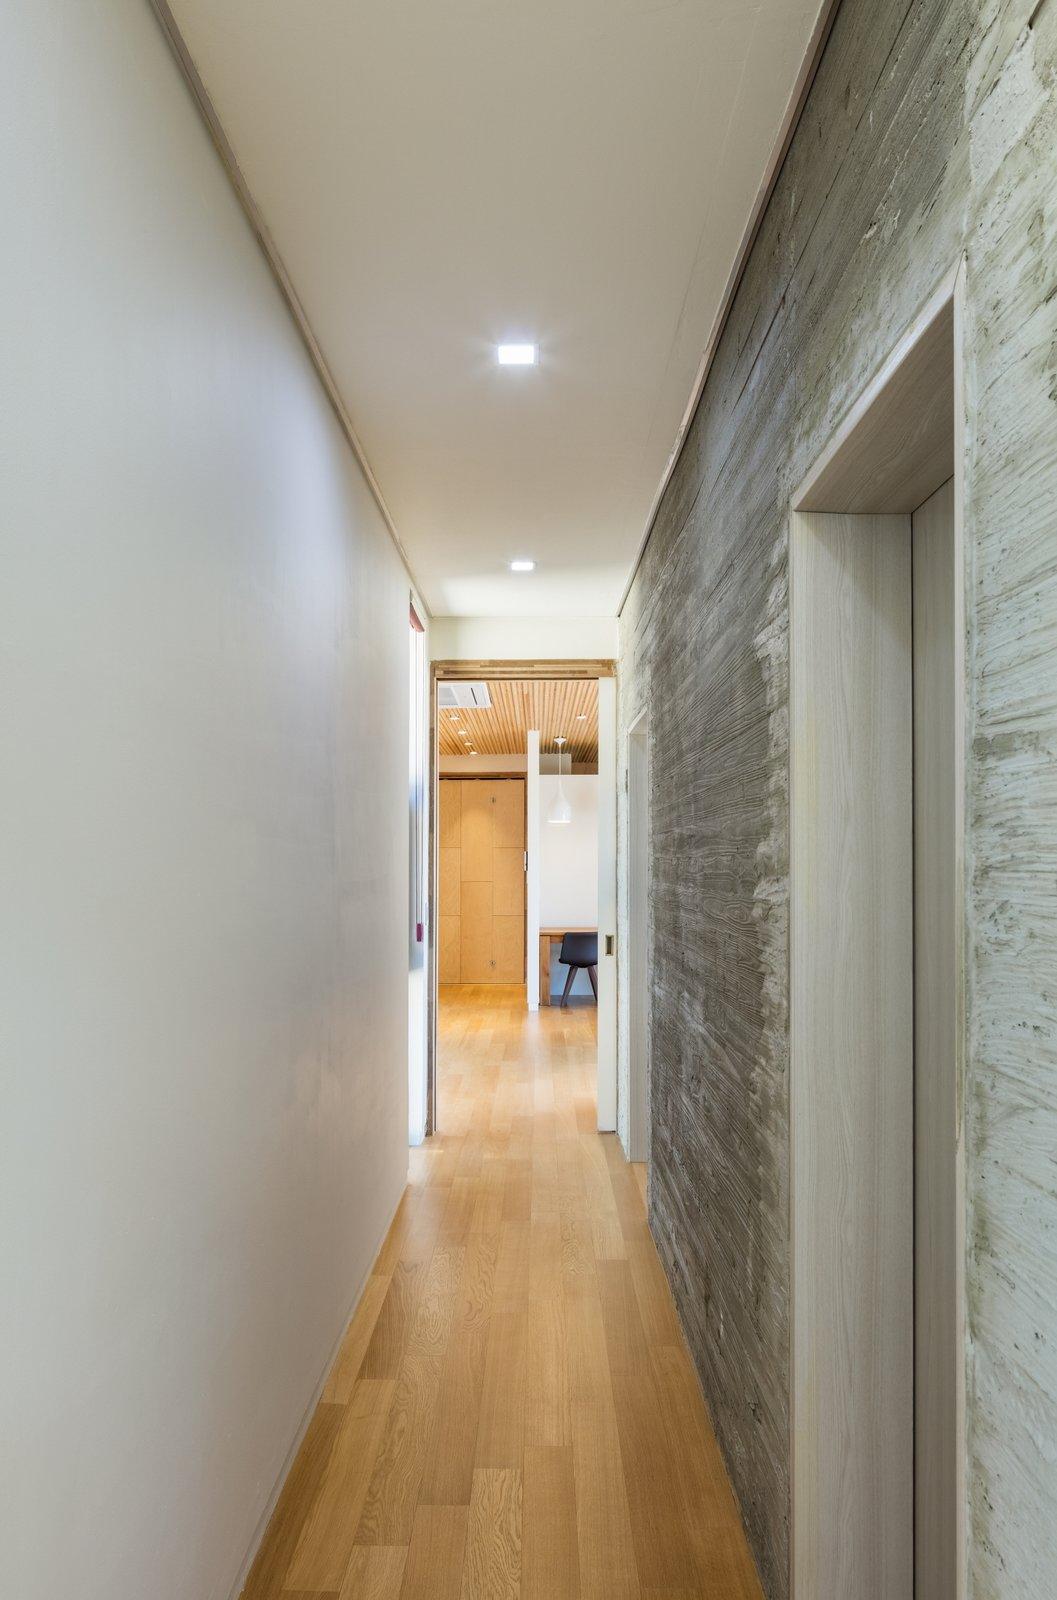 Hallway and Medium Hardwood Floor corridor  Apple Farm House by 2m2 architects